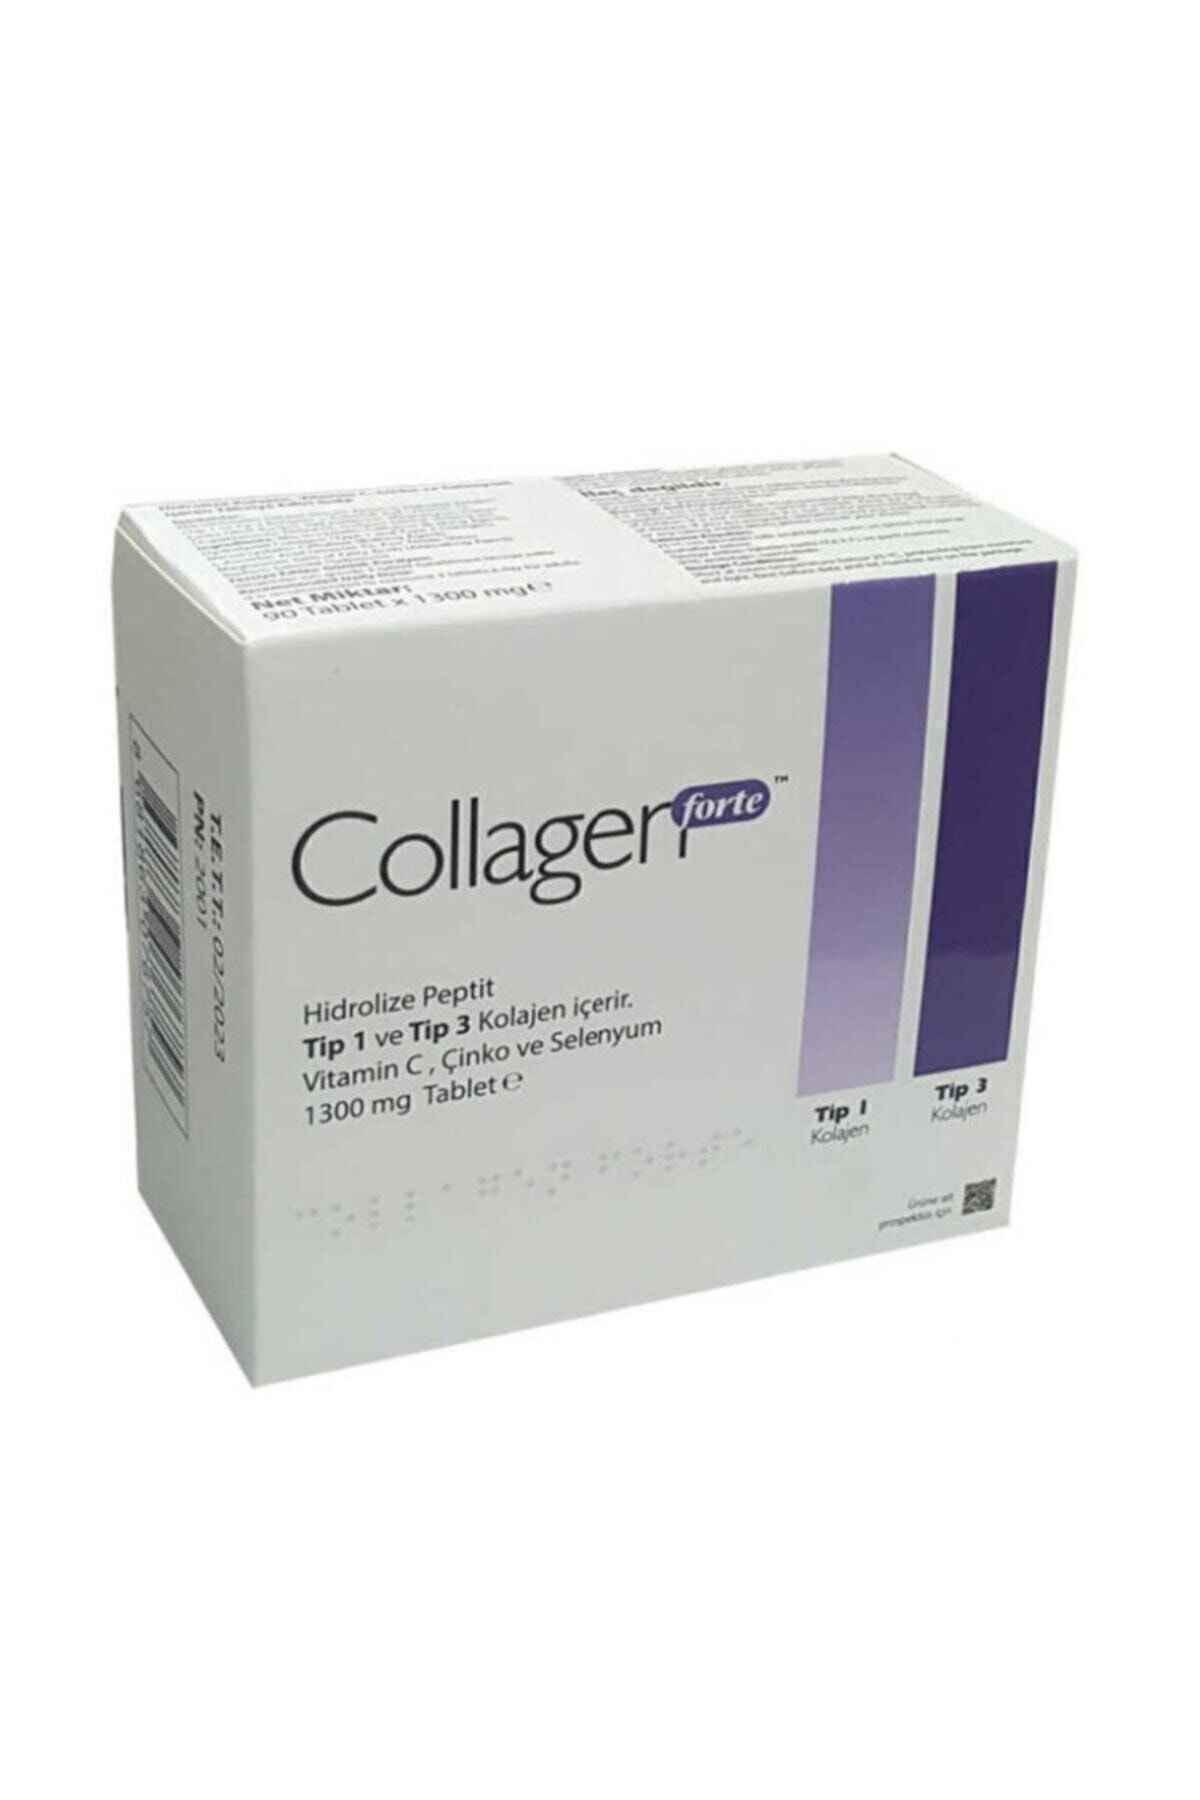 Collagen Supplement 90 Tablets dokkan abura das 180 tablets super herb detox enzyme diet support supplement